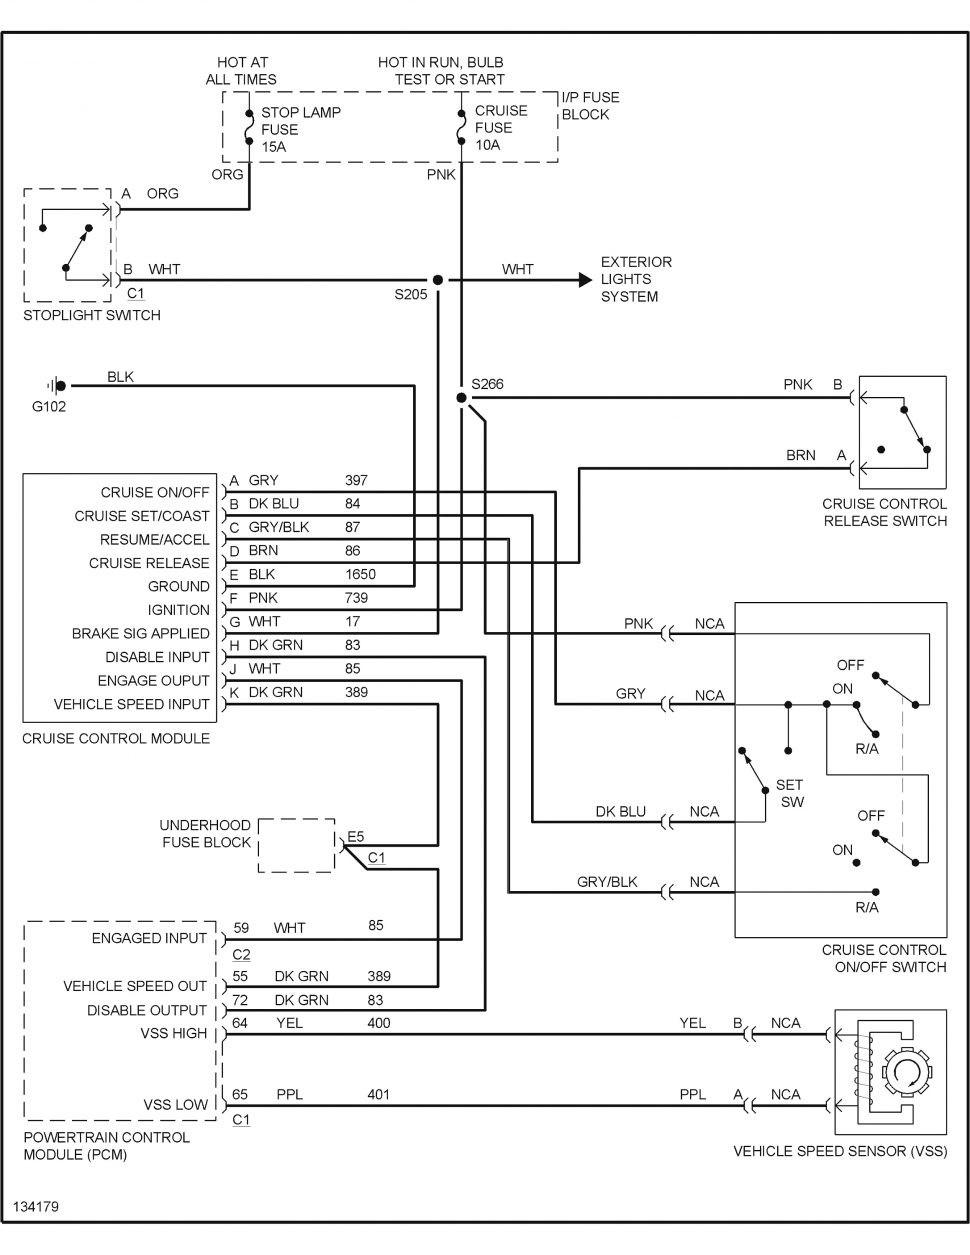 Diagram Pioneer Avh 3100dvd Wiring Diagram Full Version Hd Quality Wiring Diagram Joystickwiringdiagram Lesailesdelaliberte Fr